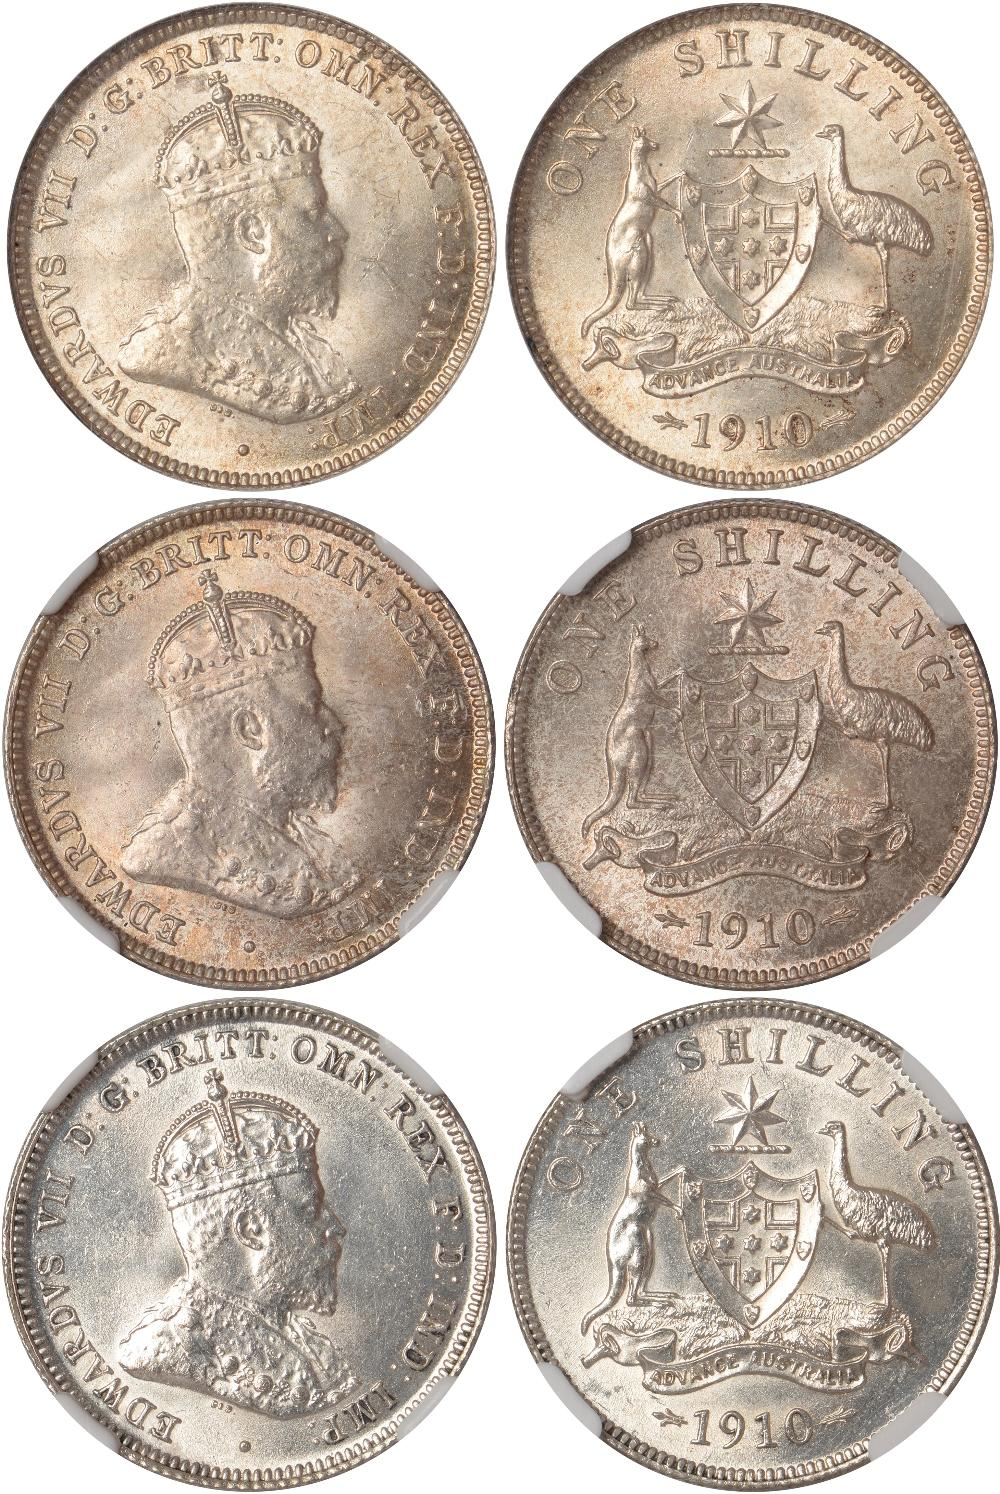 1994 Australia 10 Dollars $ Silver Coin Medal 10 Oz 313 Gram Kookaburra 75 Mm With The Best Service Commemorative